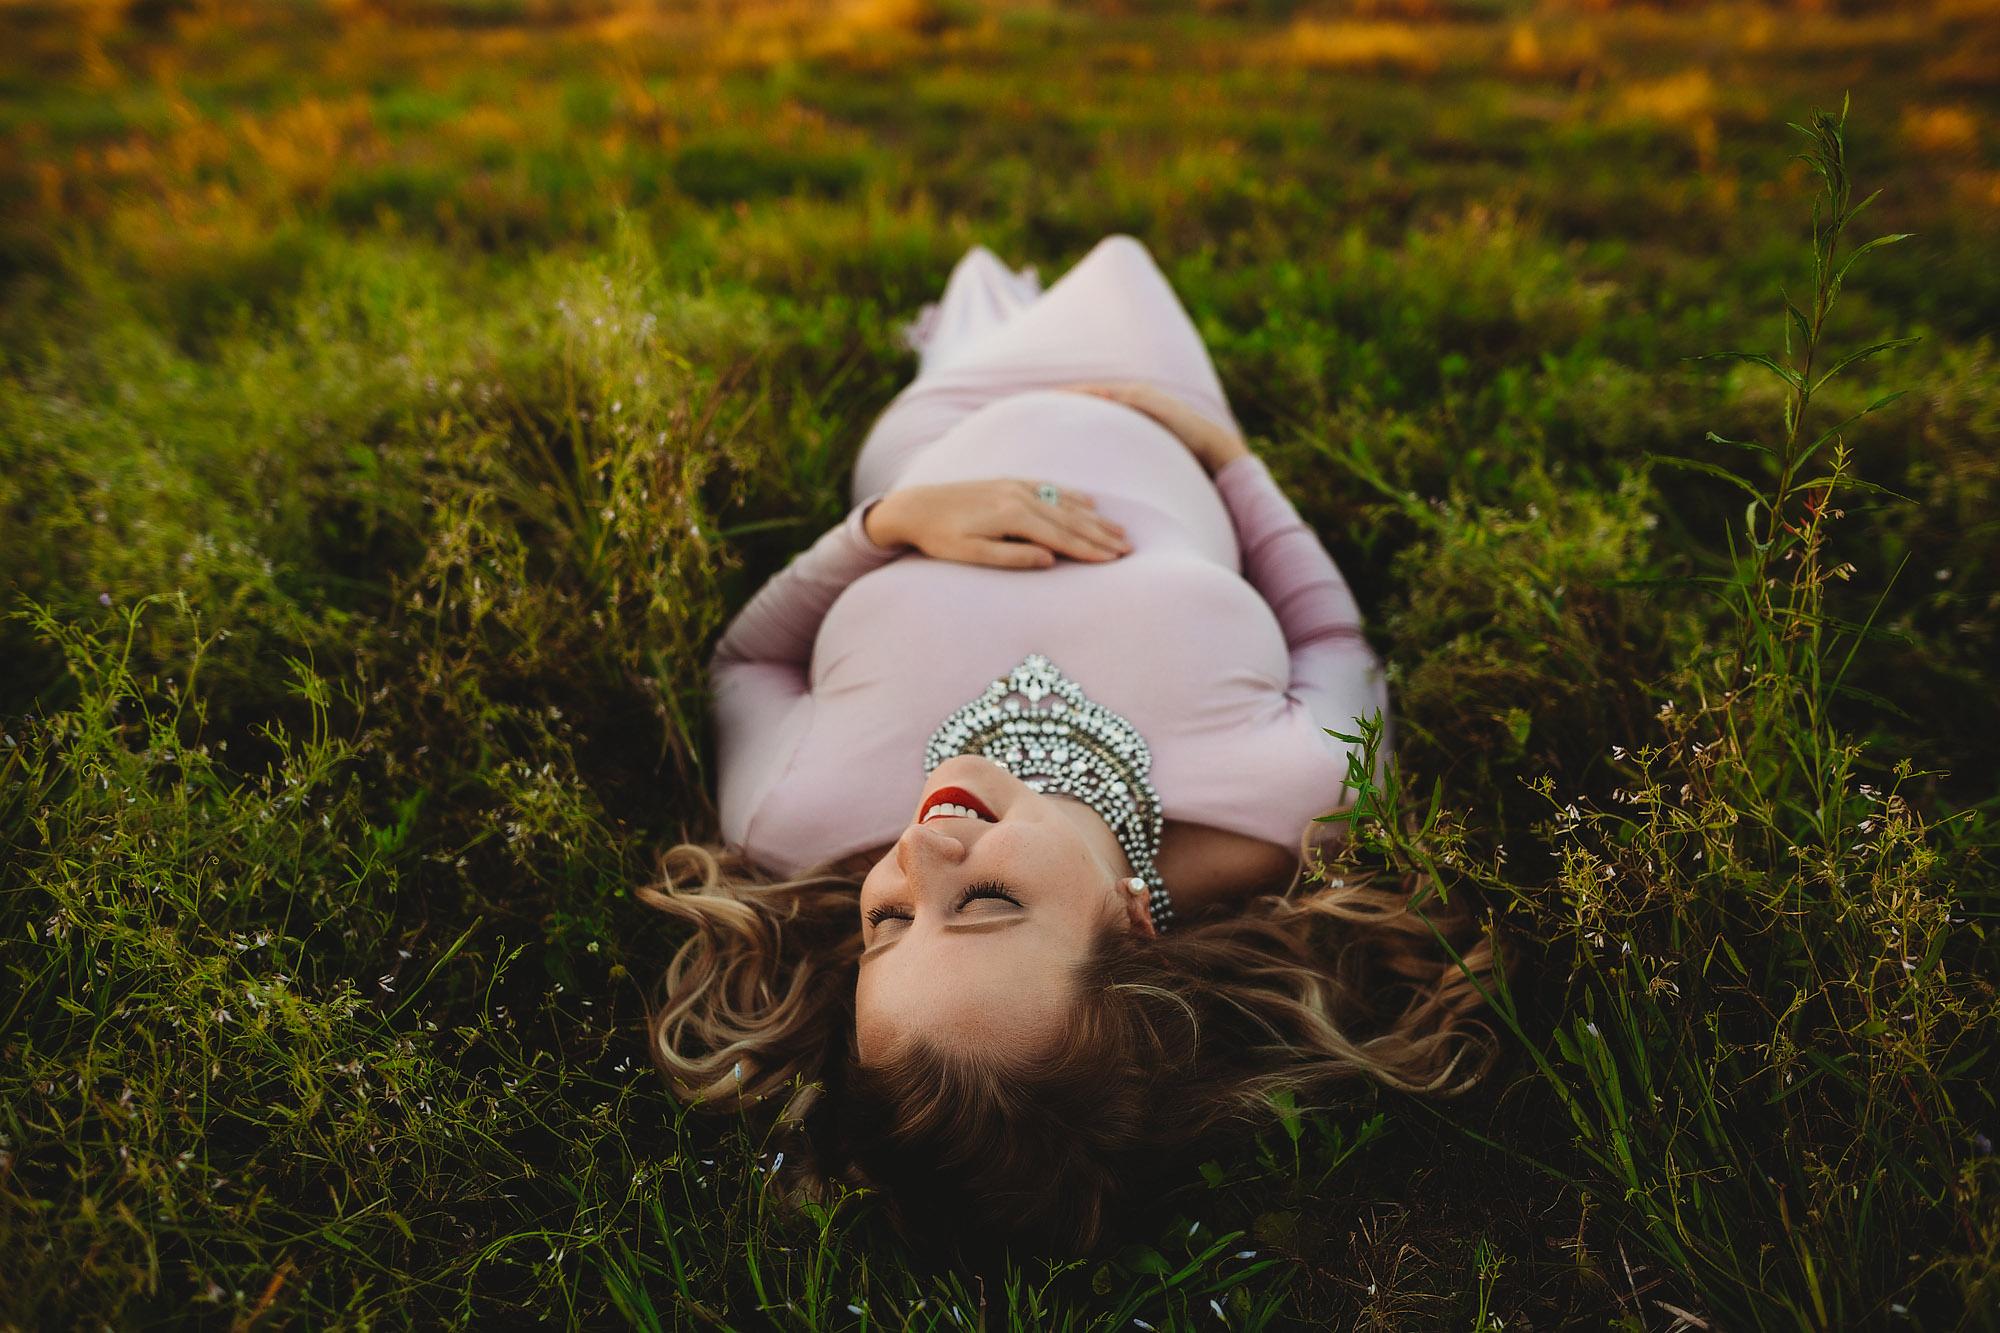 artsy maternity photography, beach maternity portraits at st Pete fl